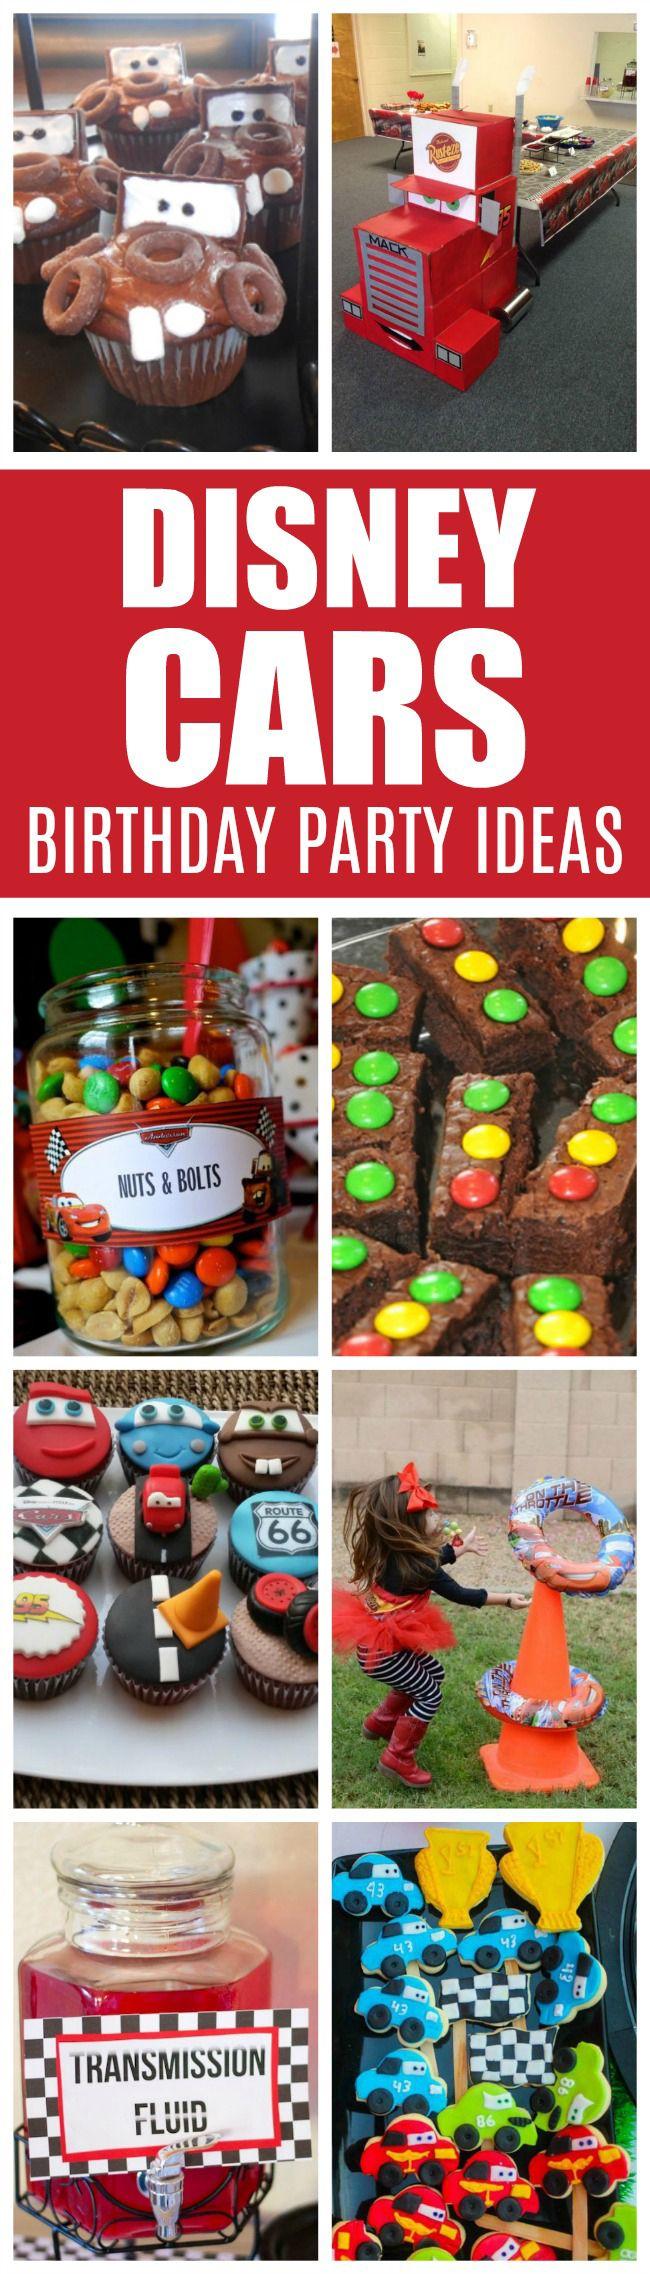 20 Disney Pixars Cars Party Ideas | Pretty My Party